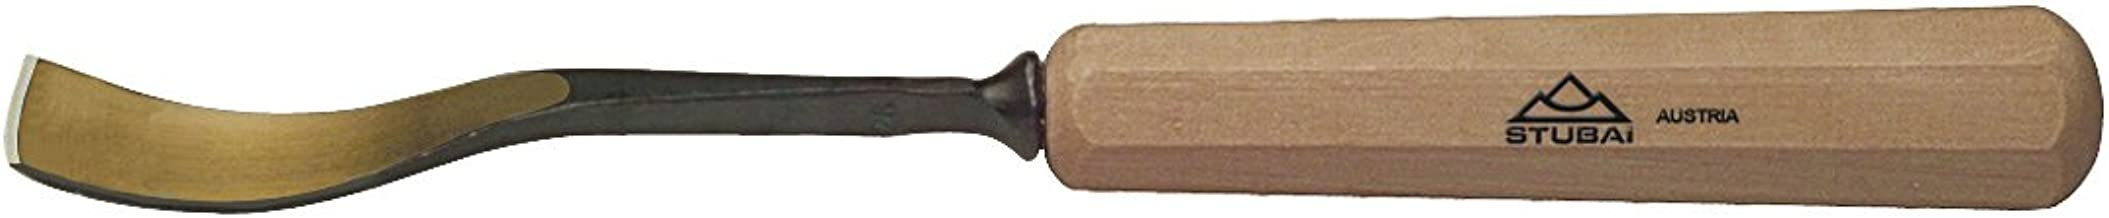 7 mm Argent//Brun Stubai 477007 Emporte-pi/èce